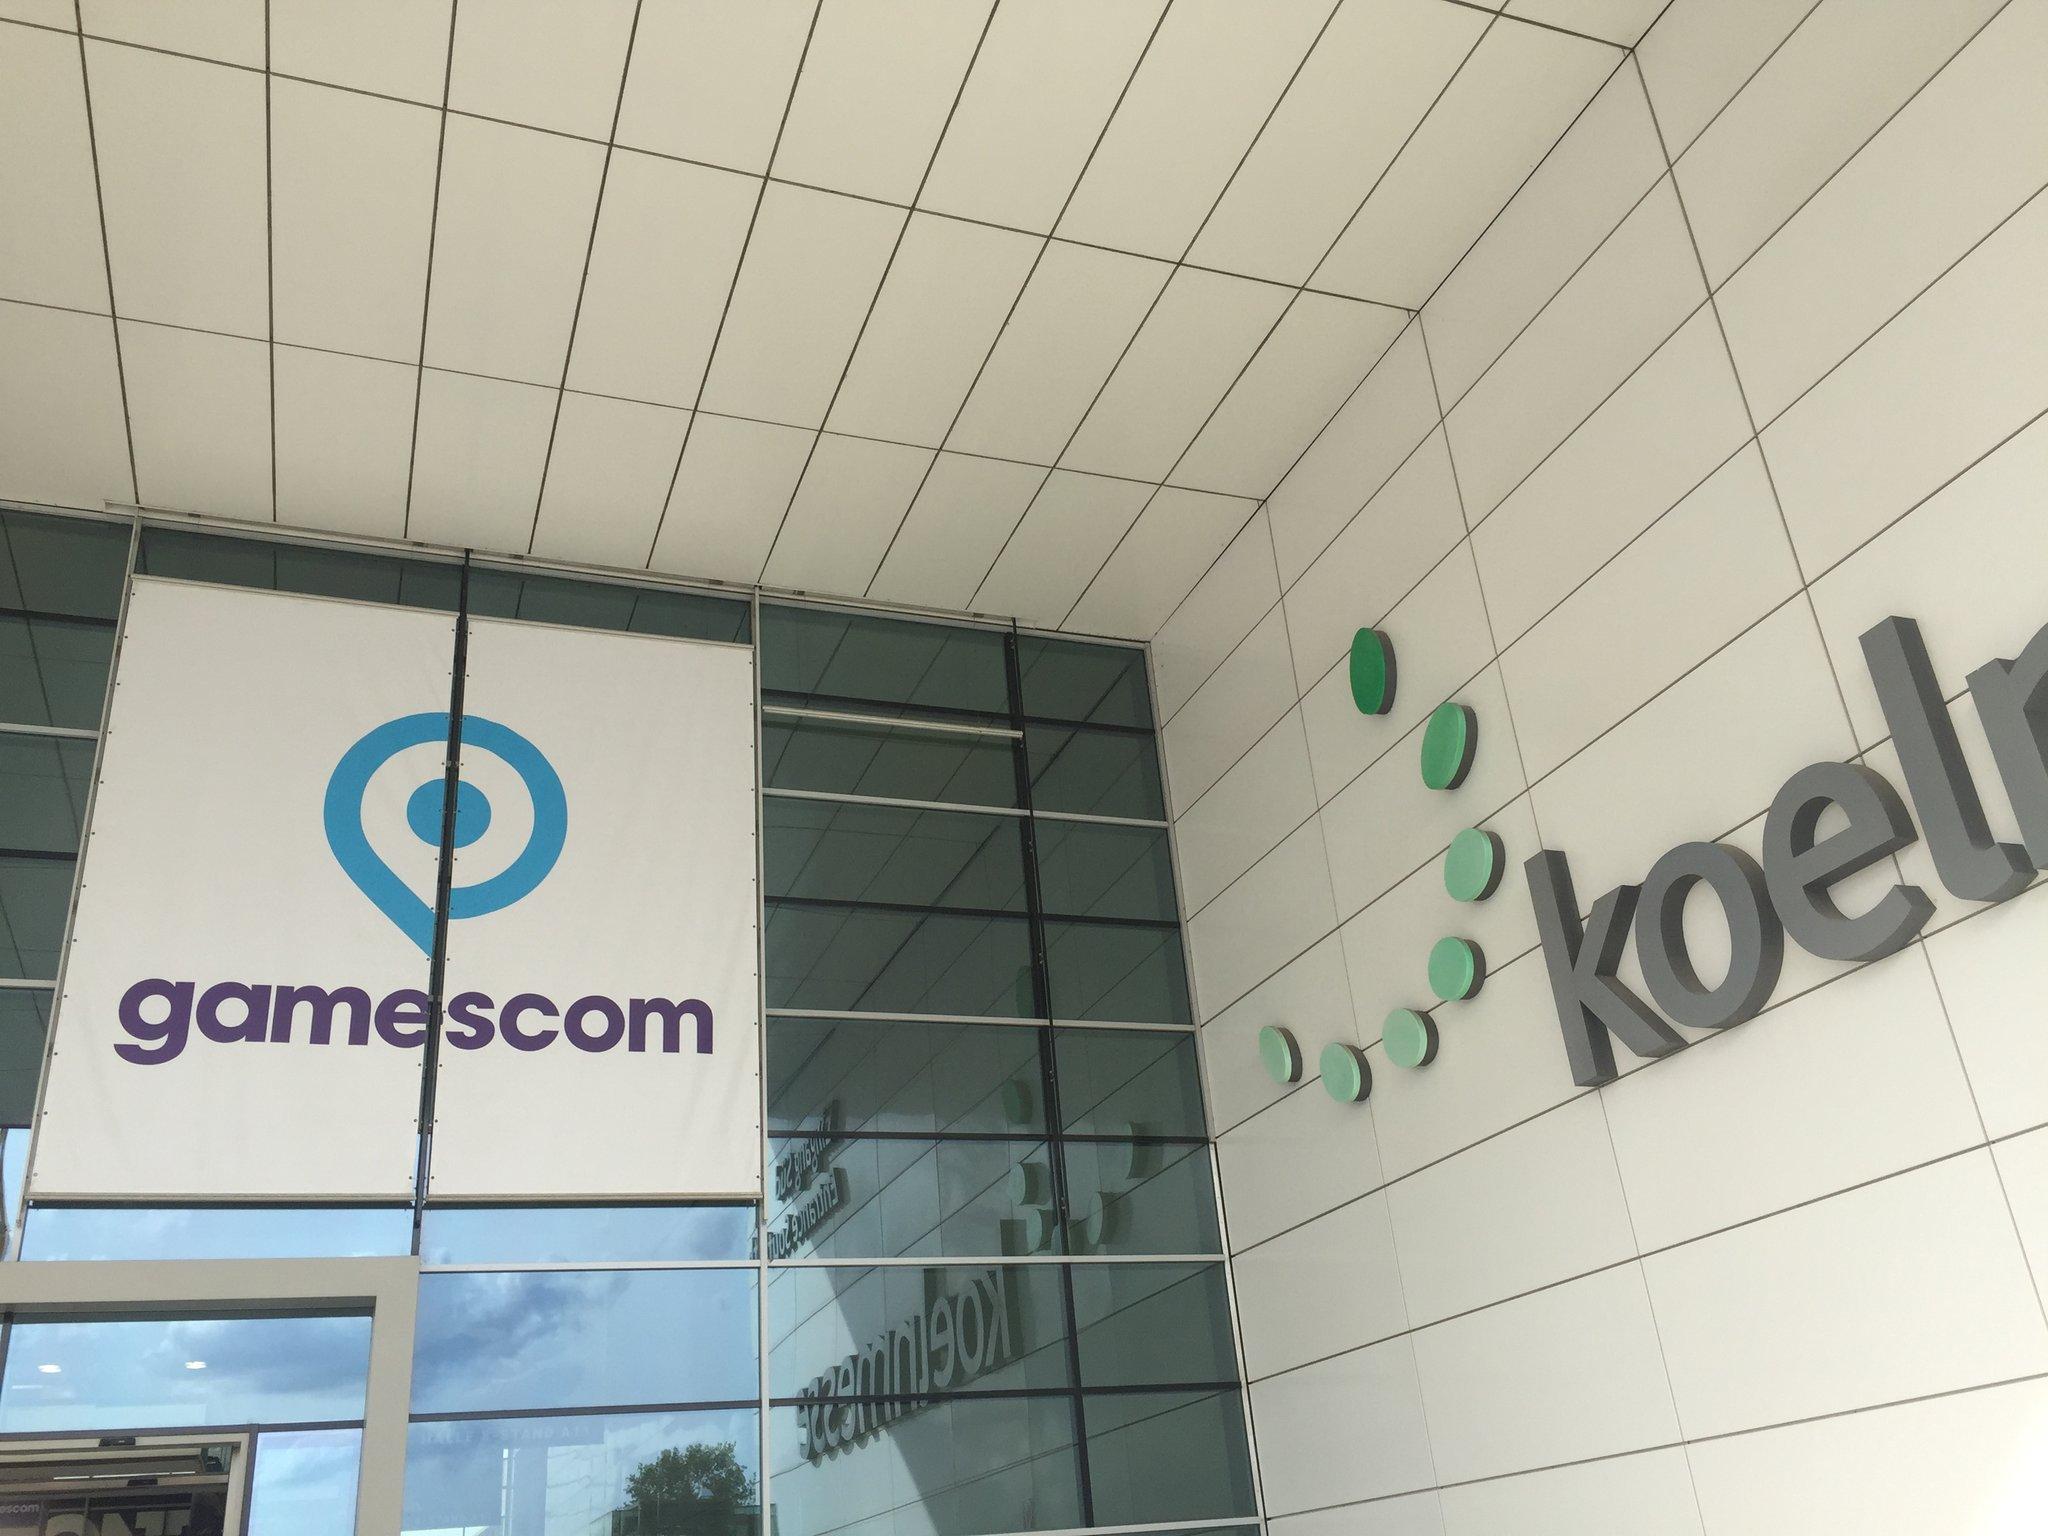 gamescom_2019_suedeingang zusammengebaut.com